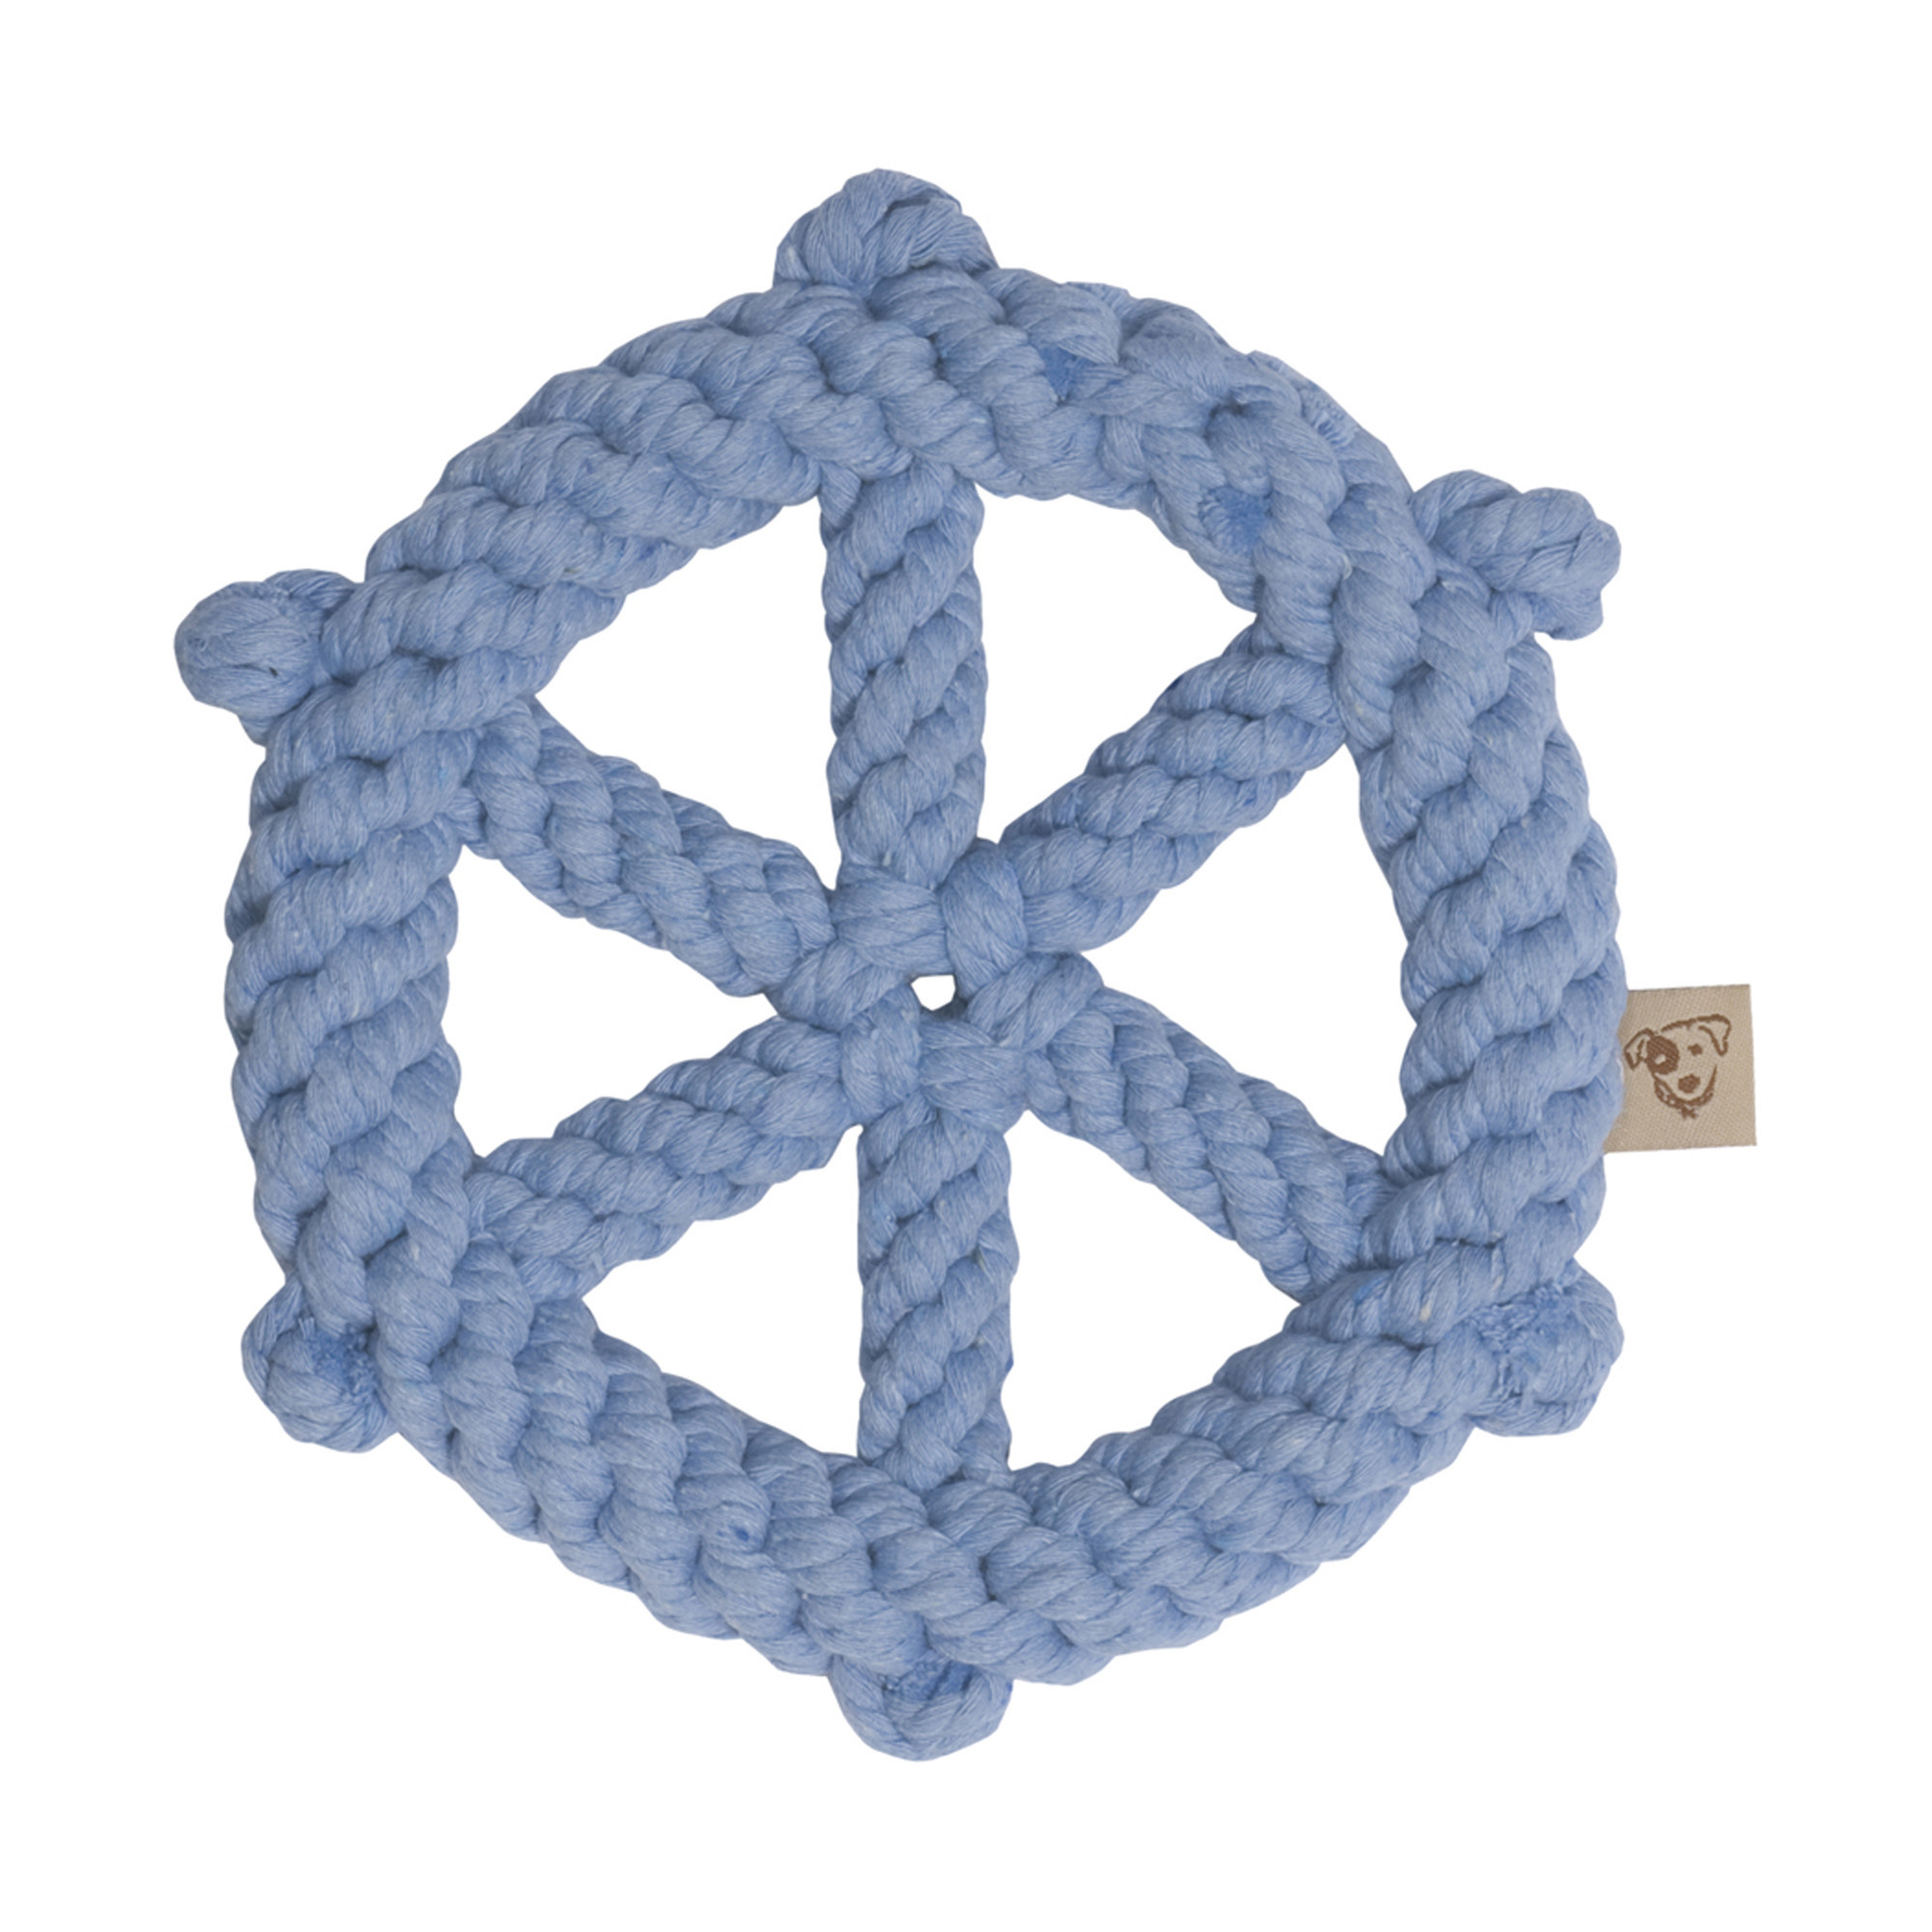 Ship wheel rope toy